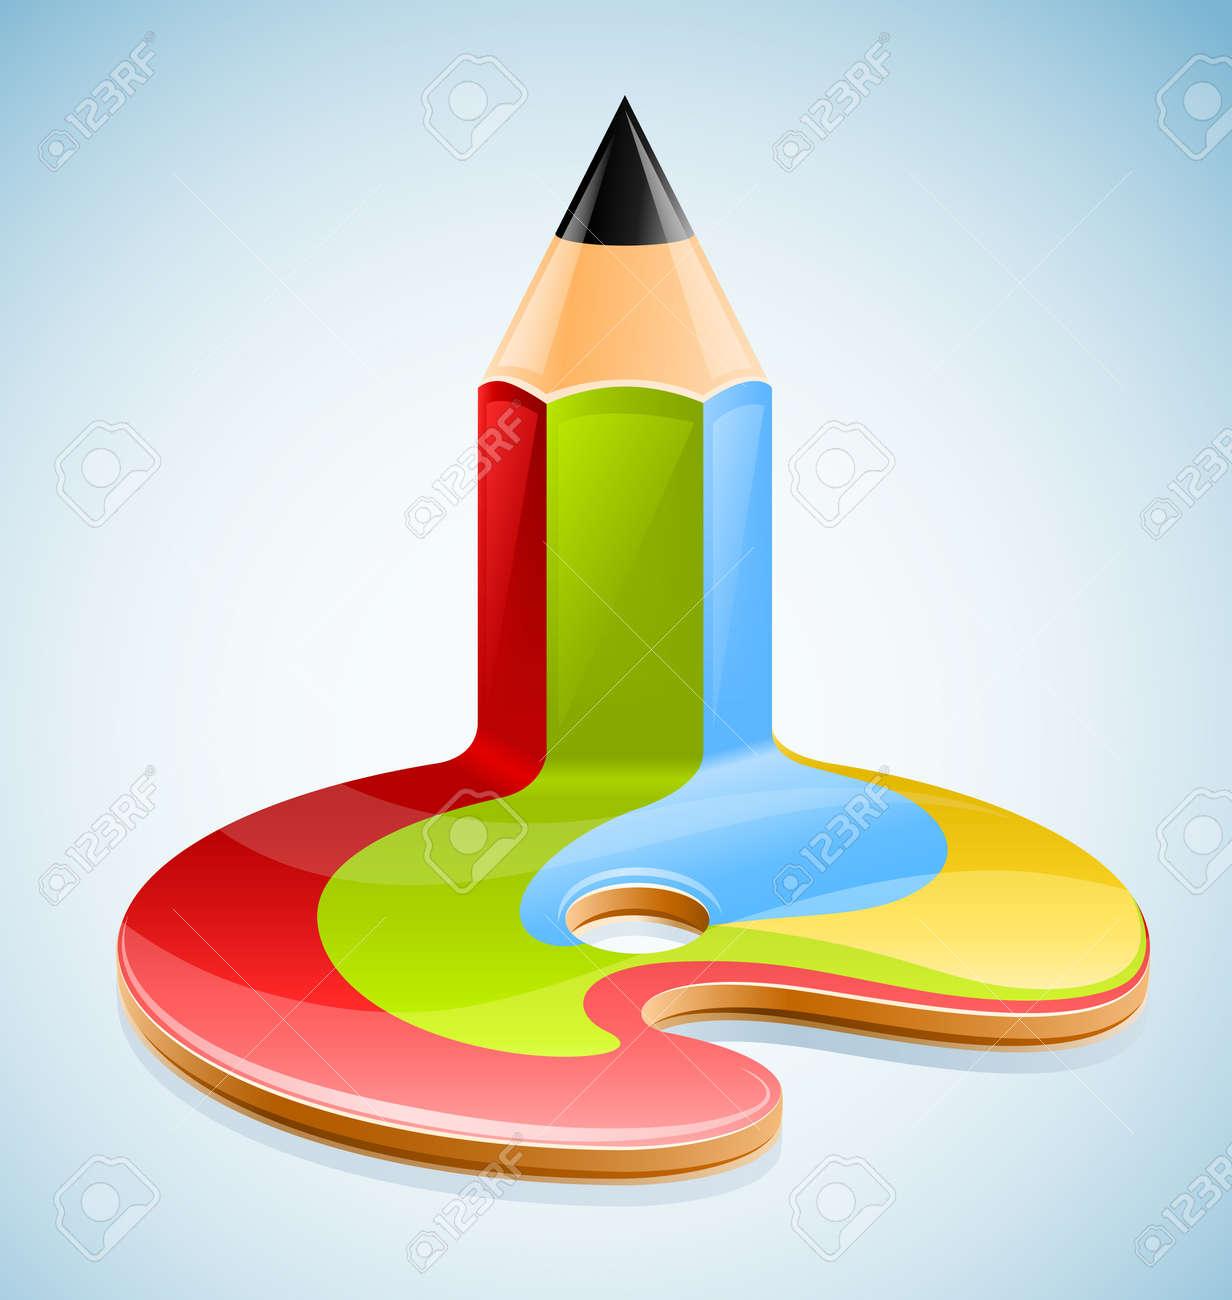 pencil as symbol of visual art illustration Stock Vector - 9830115